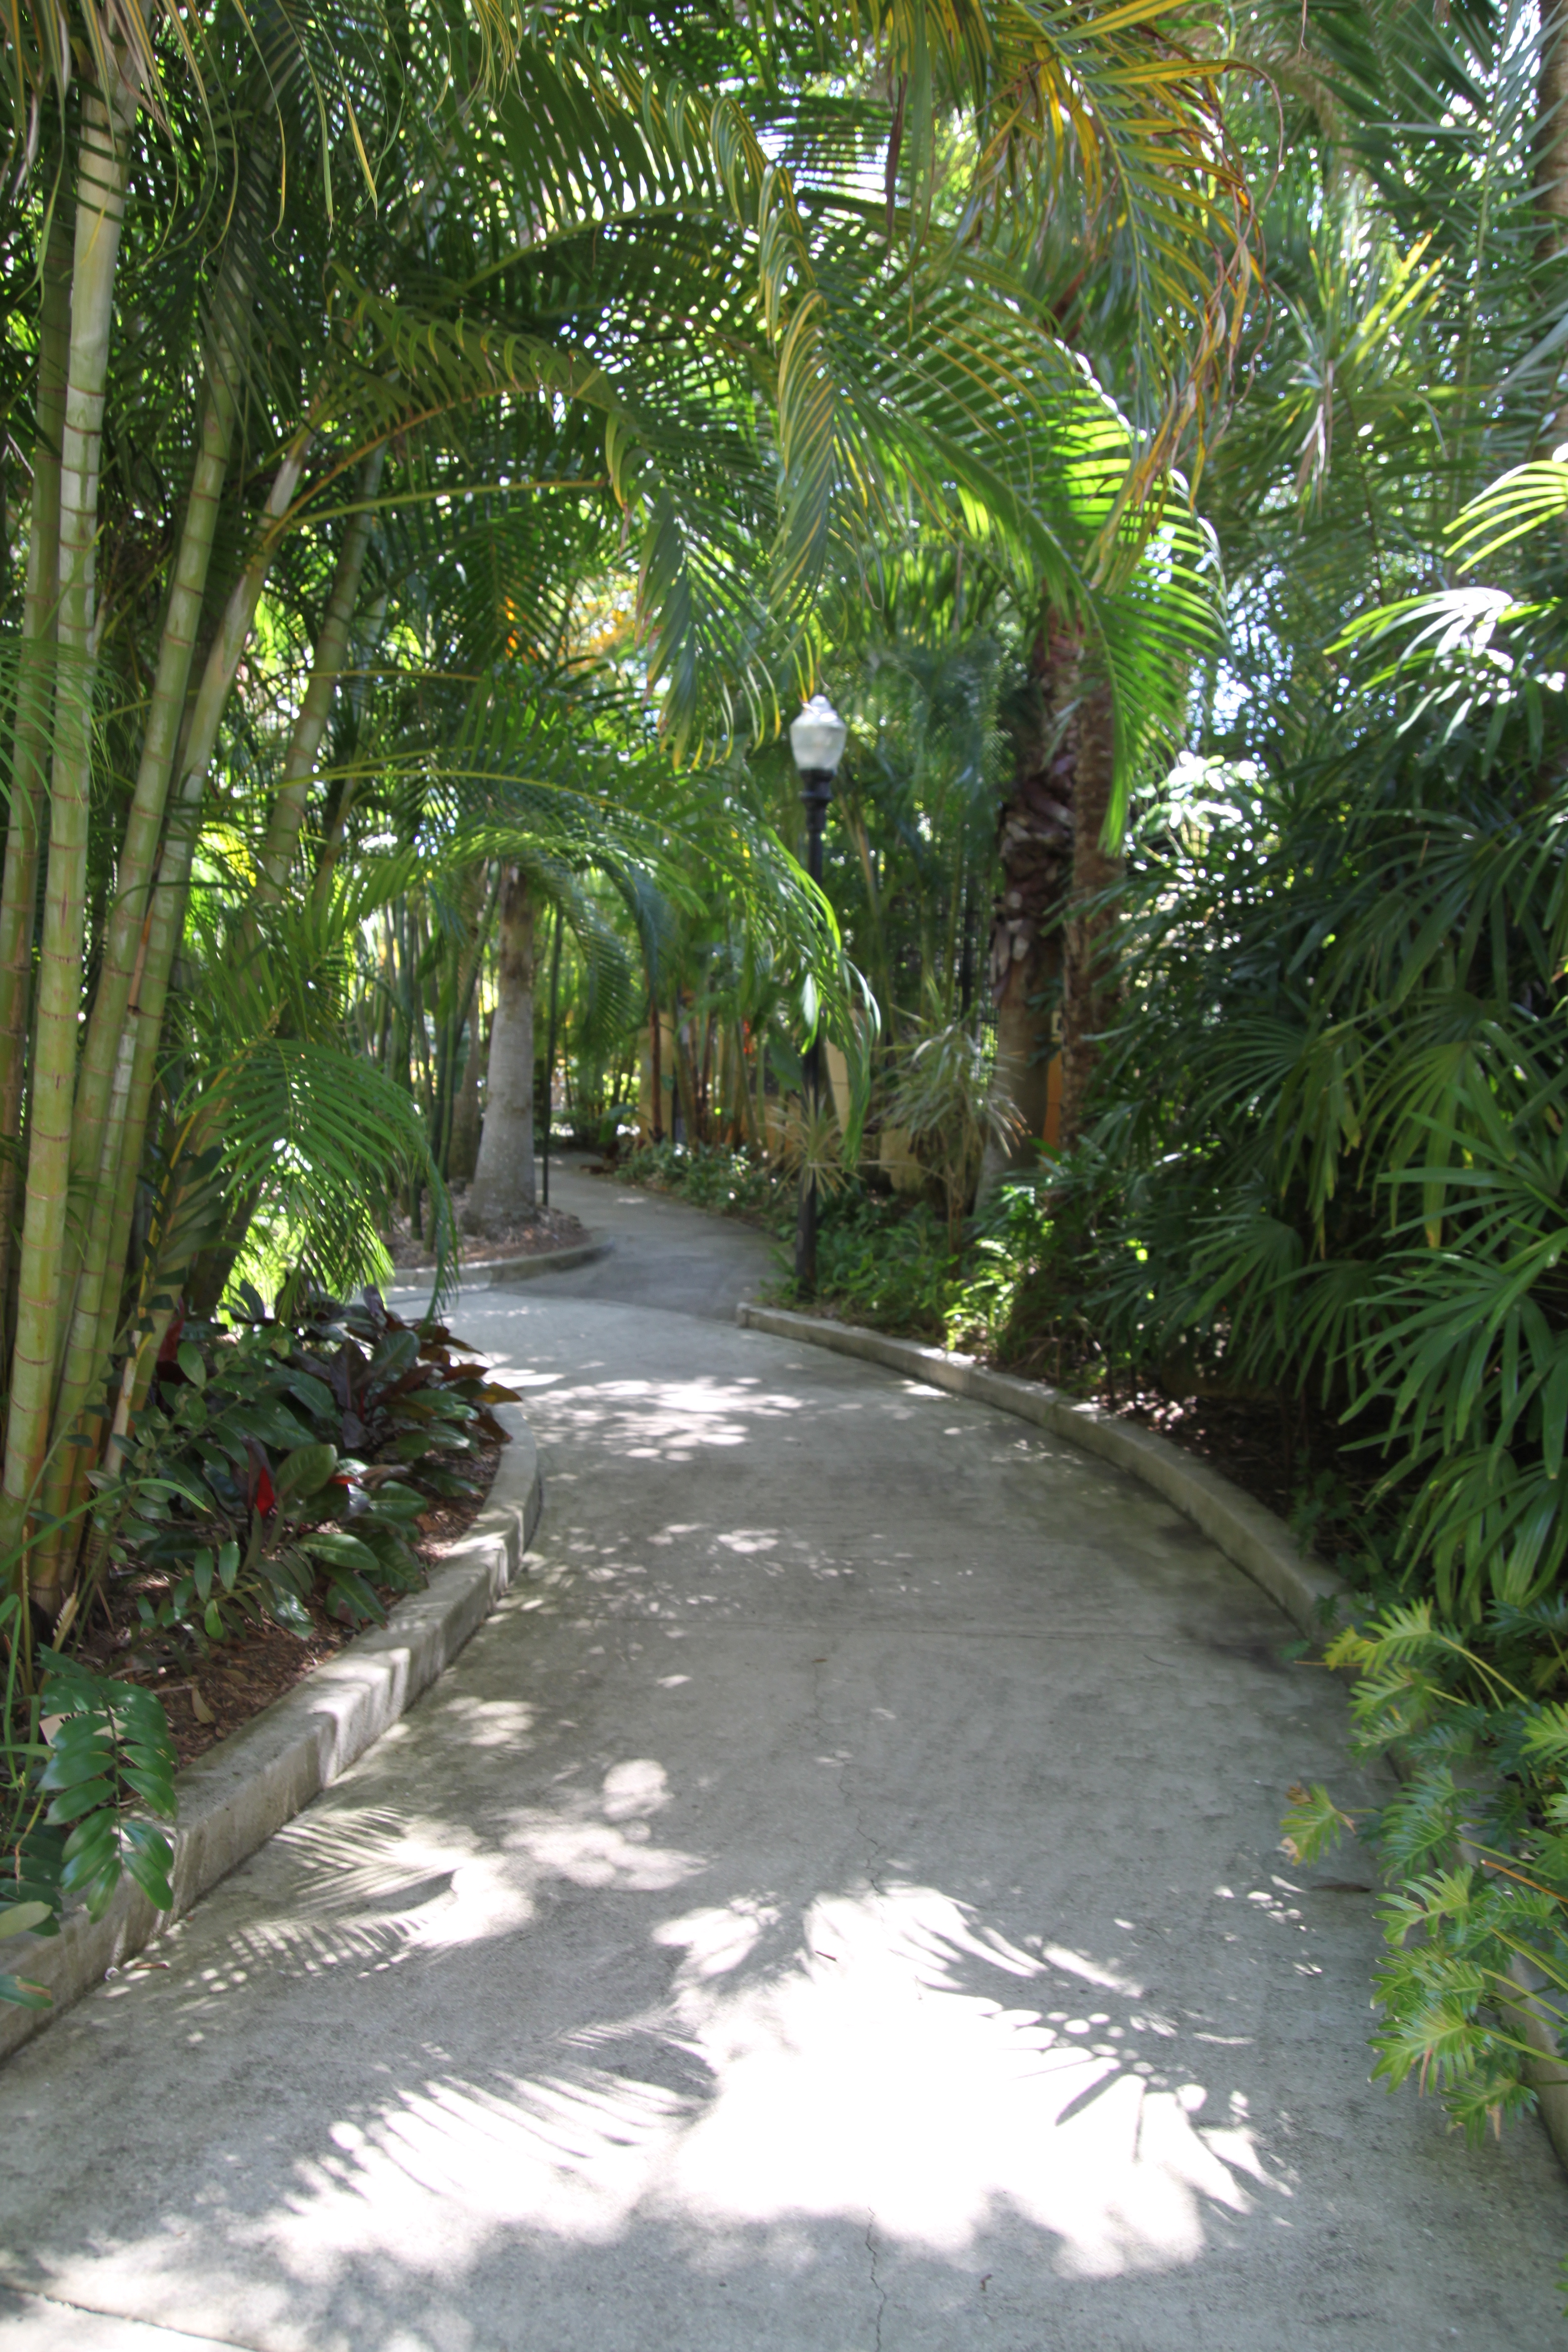 Road Trip Sunken Gardens St Petersburg Florida Hort Travels